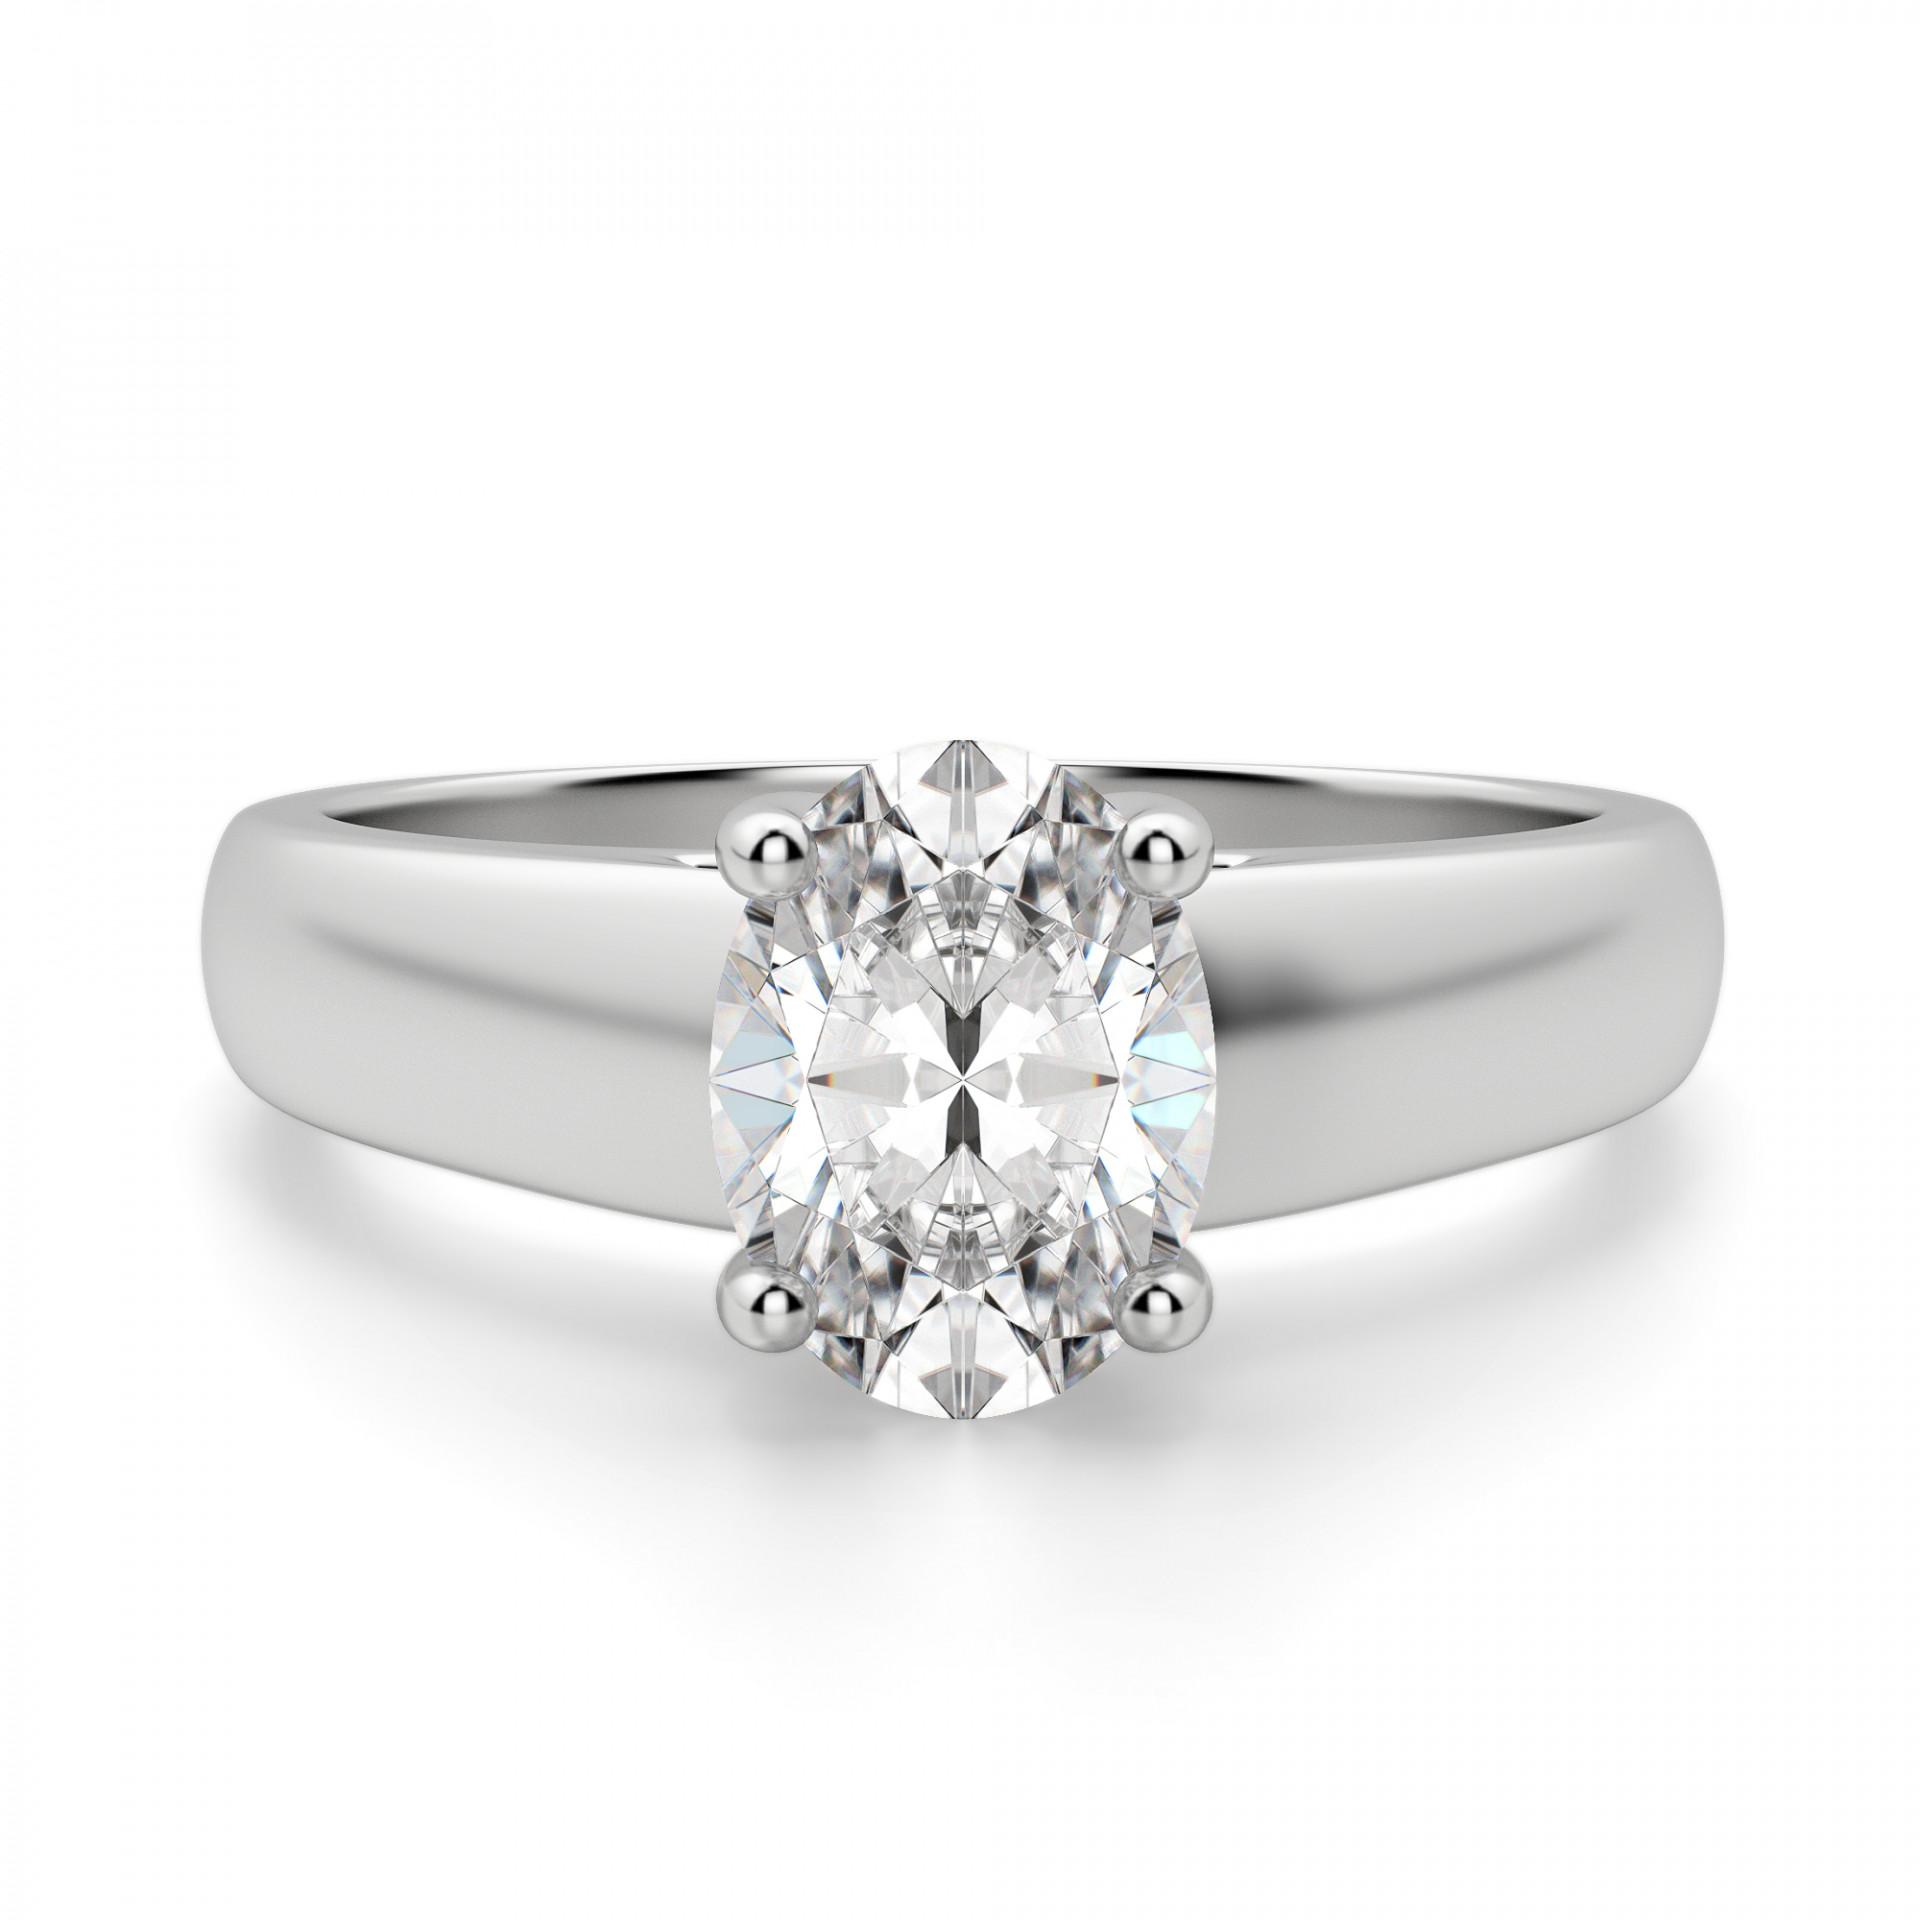 6df7b0e2b2306 Jillian Oval Cut Engagement Ring